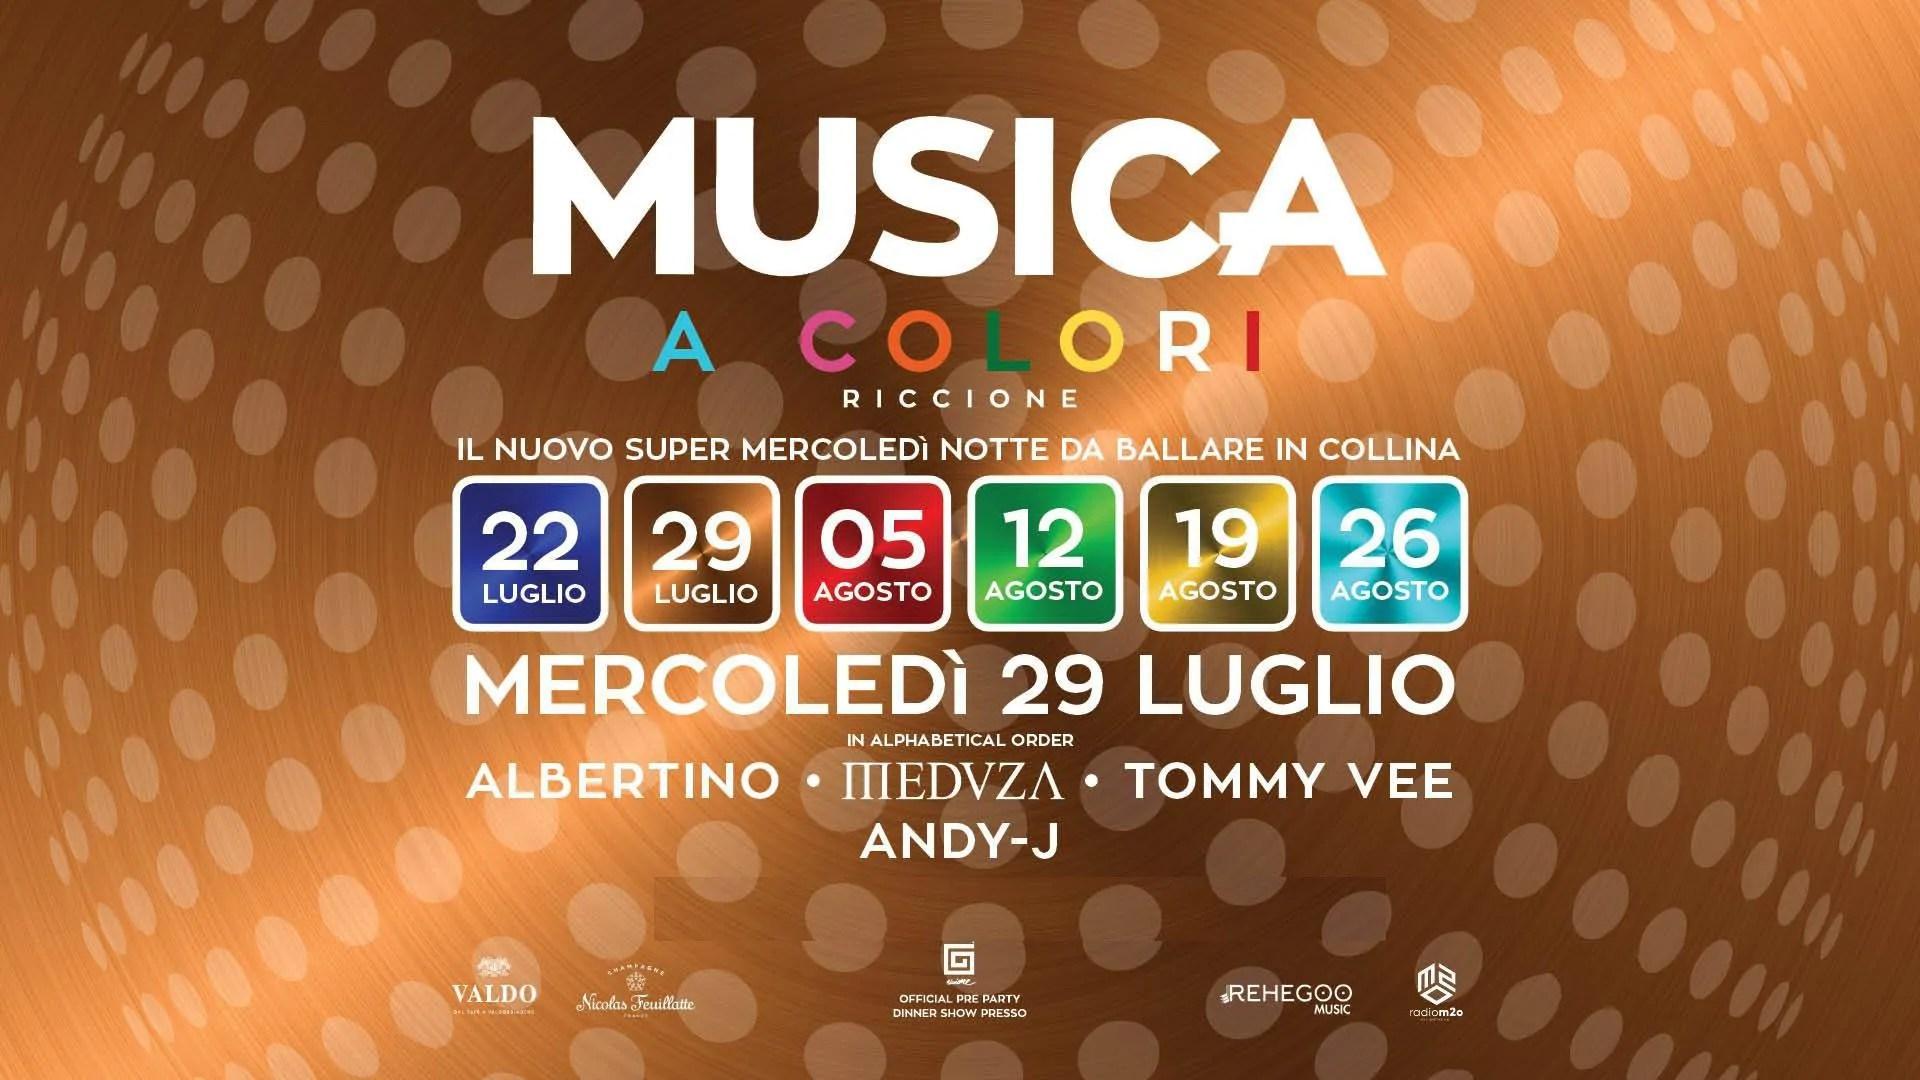 Albertino-meduza-musica-mercoledì-29-luglio1